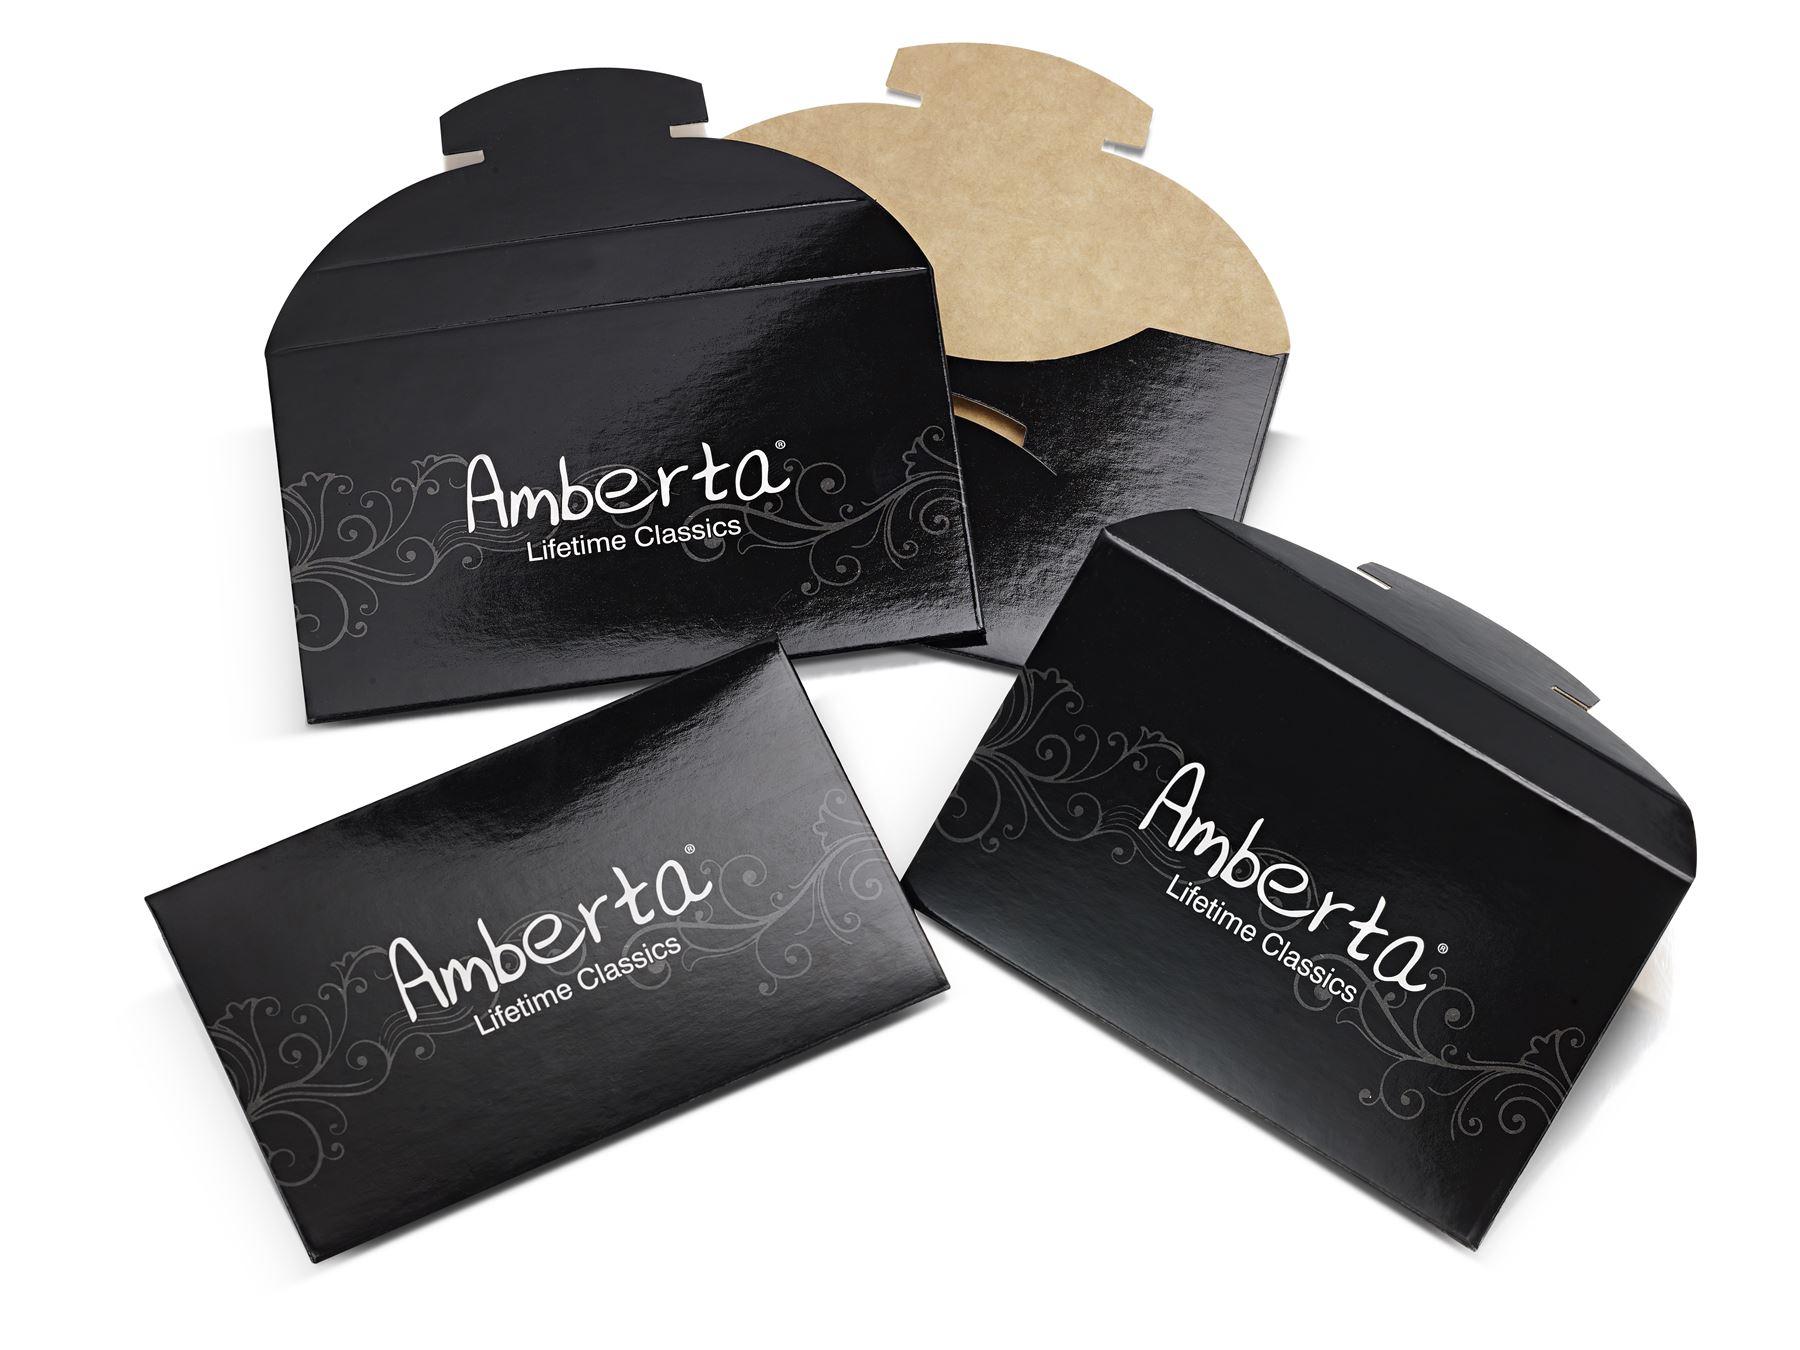 Amberta-Jewelry-925-Sterling-Silver-Adjustable-Bracelet-Italian-Bangle-for-Women thumbnail 34